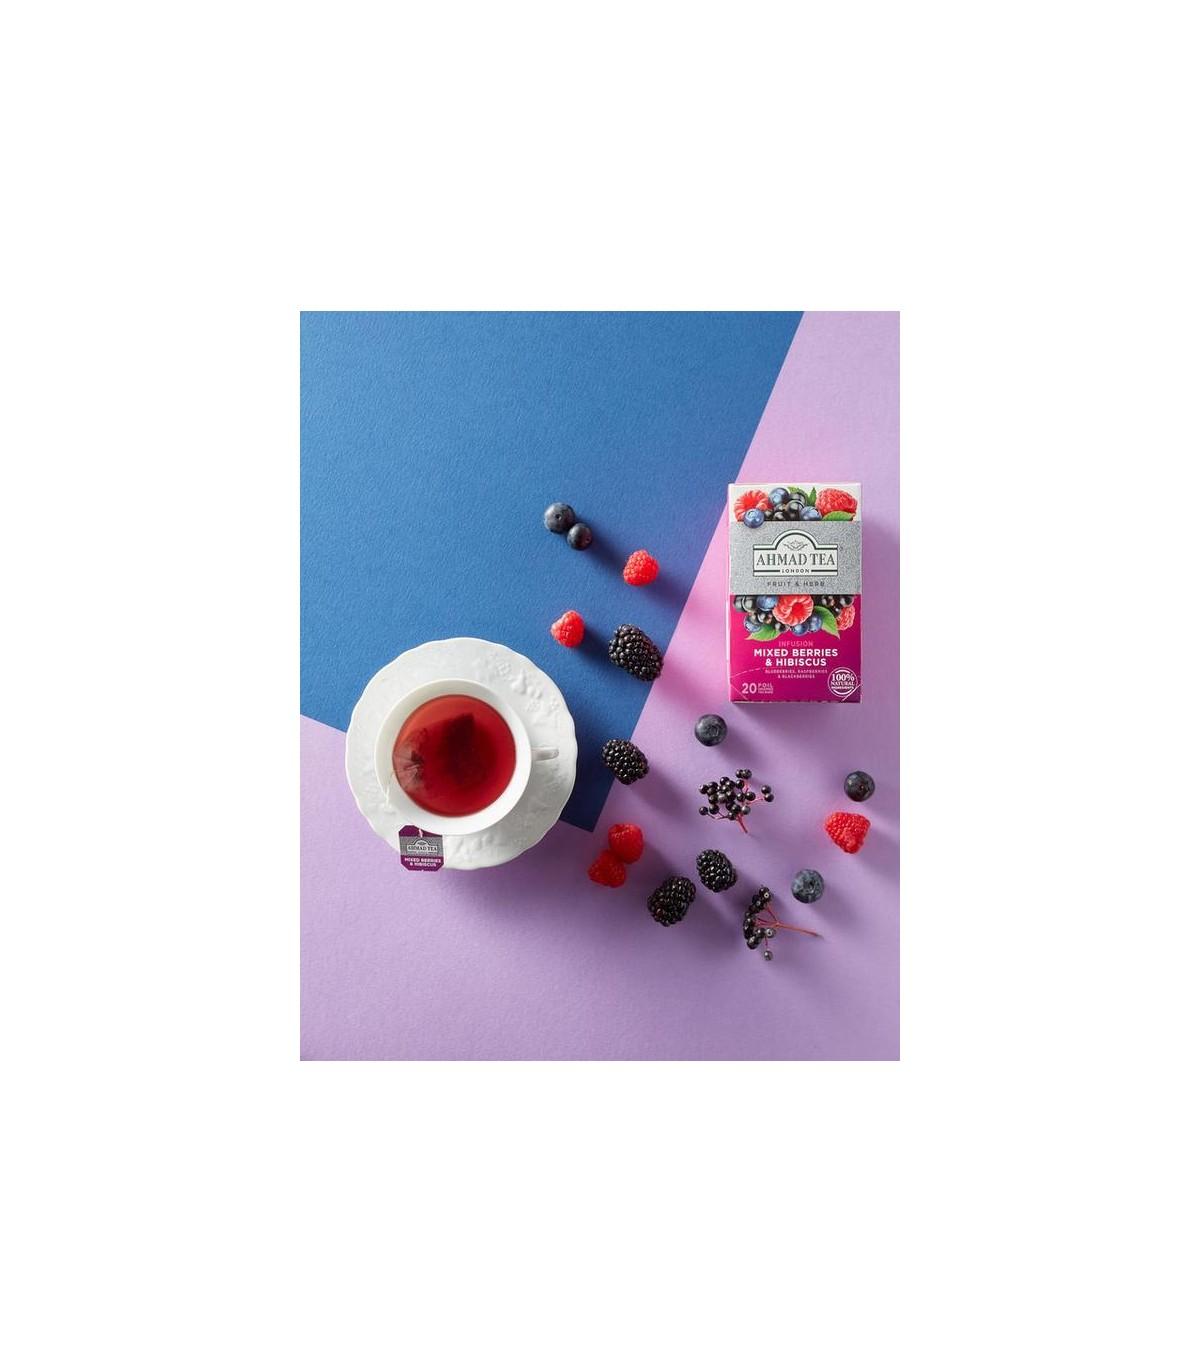 Ahmad tea دمنوش مخلوط بری ها و چای ترش 20 عددی احمد تی